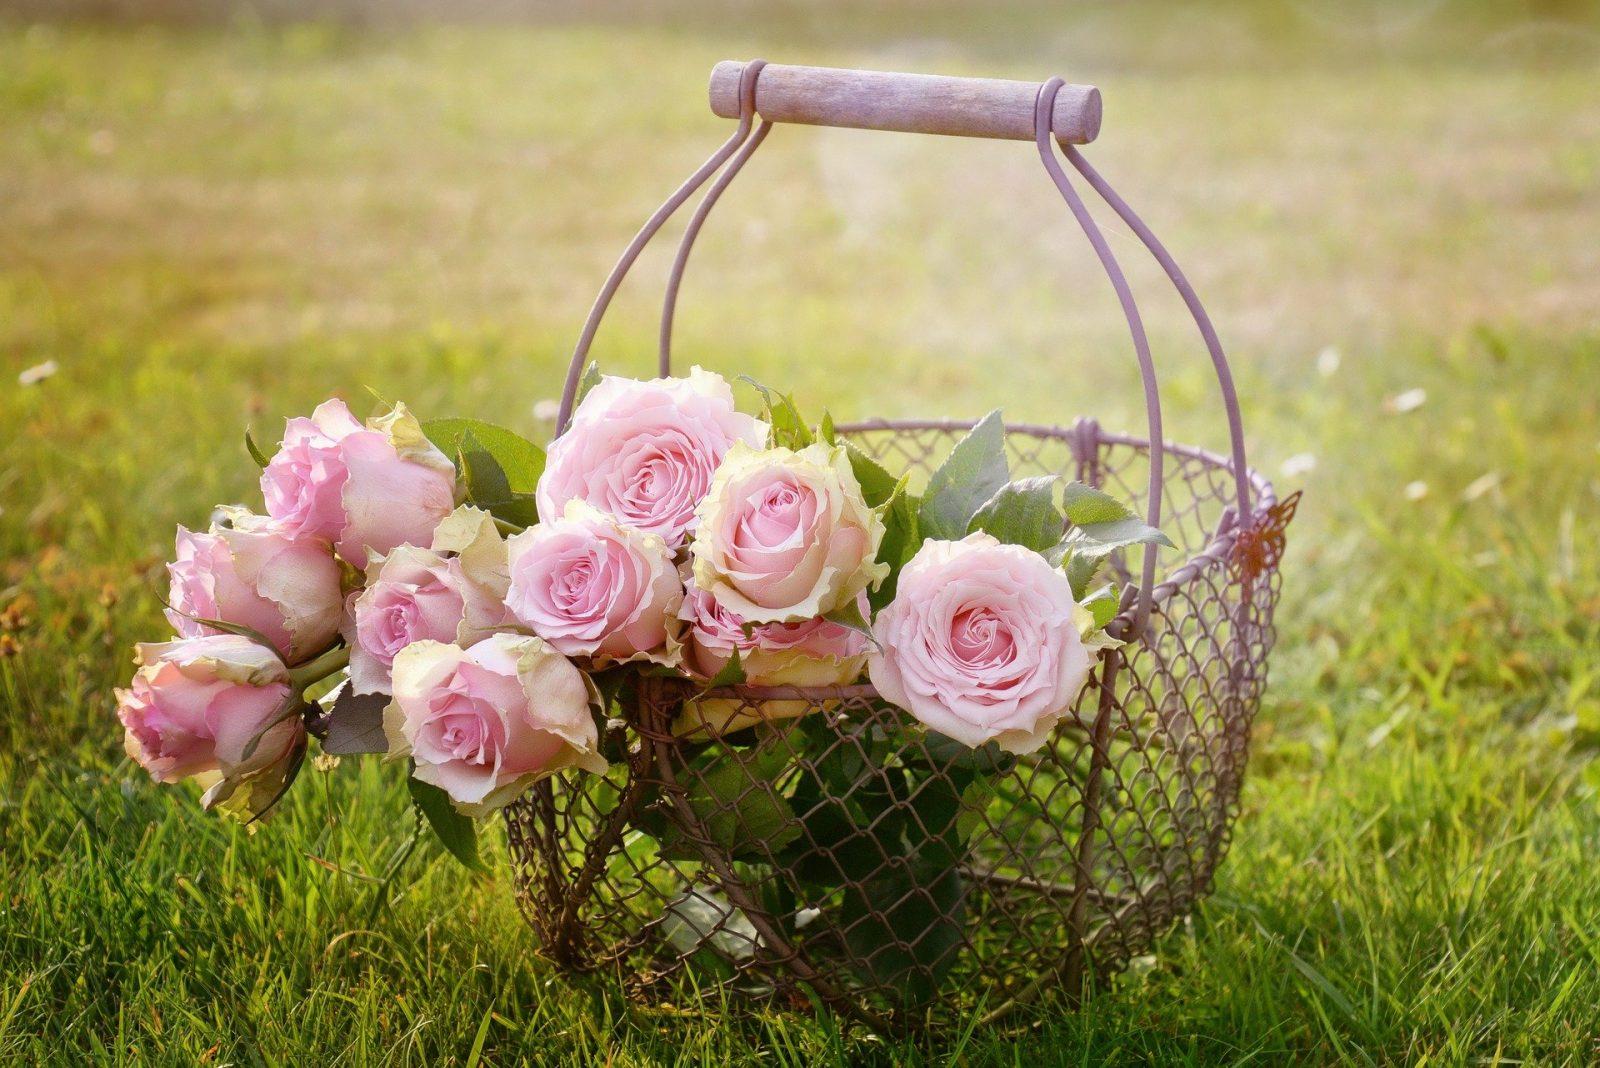 roses 1566792 1920